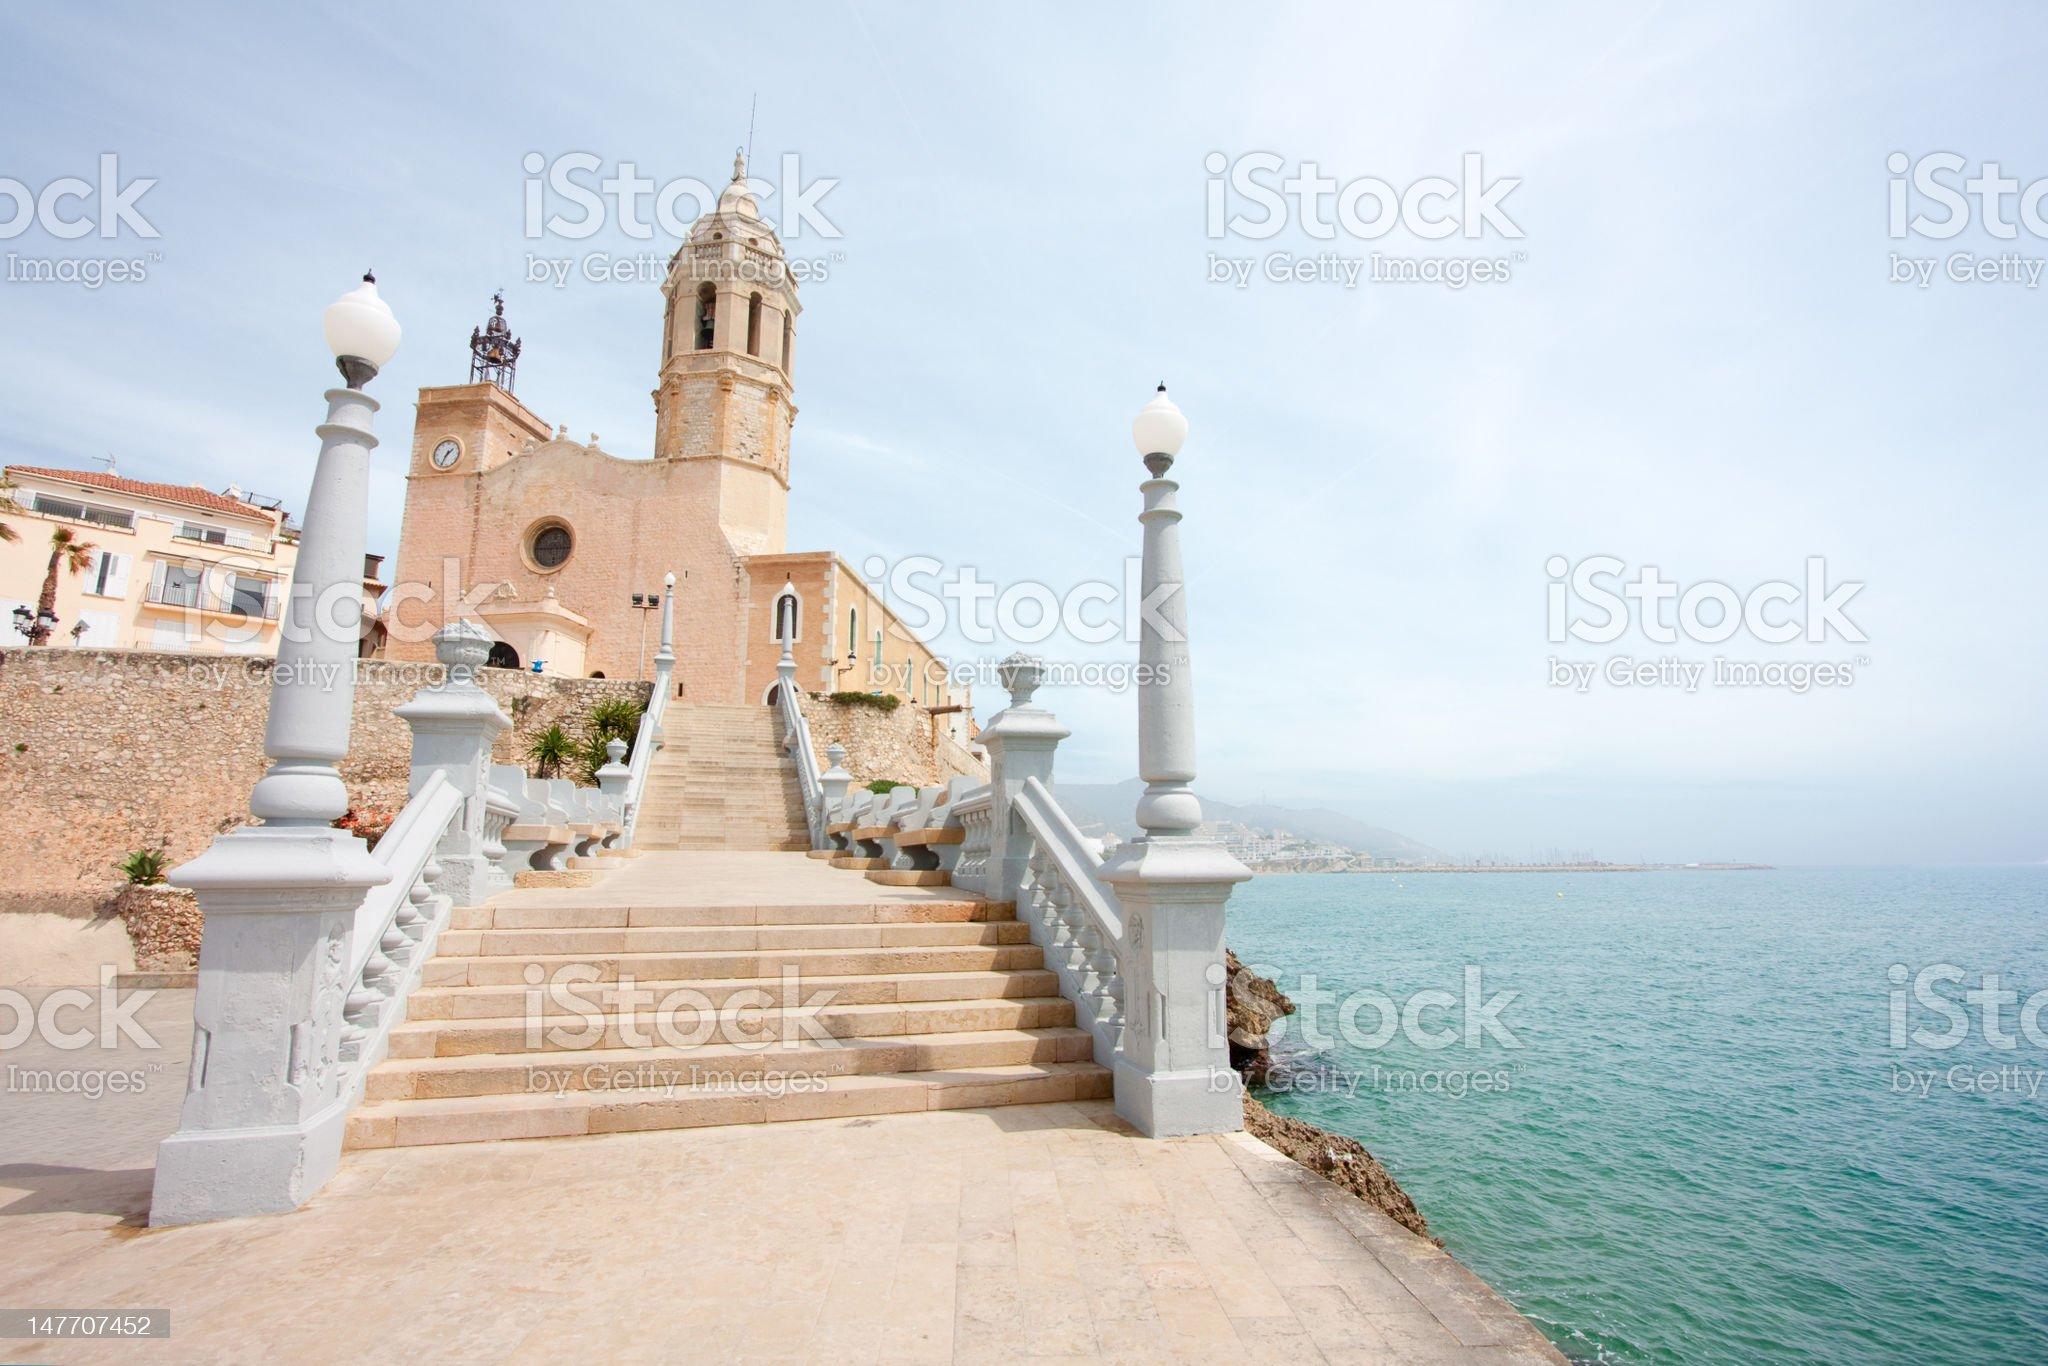 Church of Sant Bertomeu and Santa Tecla in Sitges (Barcelona) royalty-free stock photo